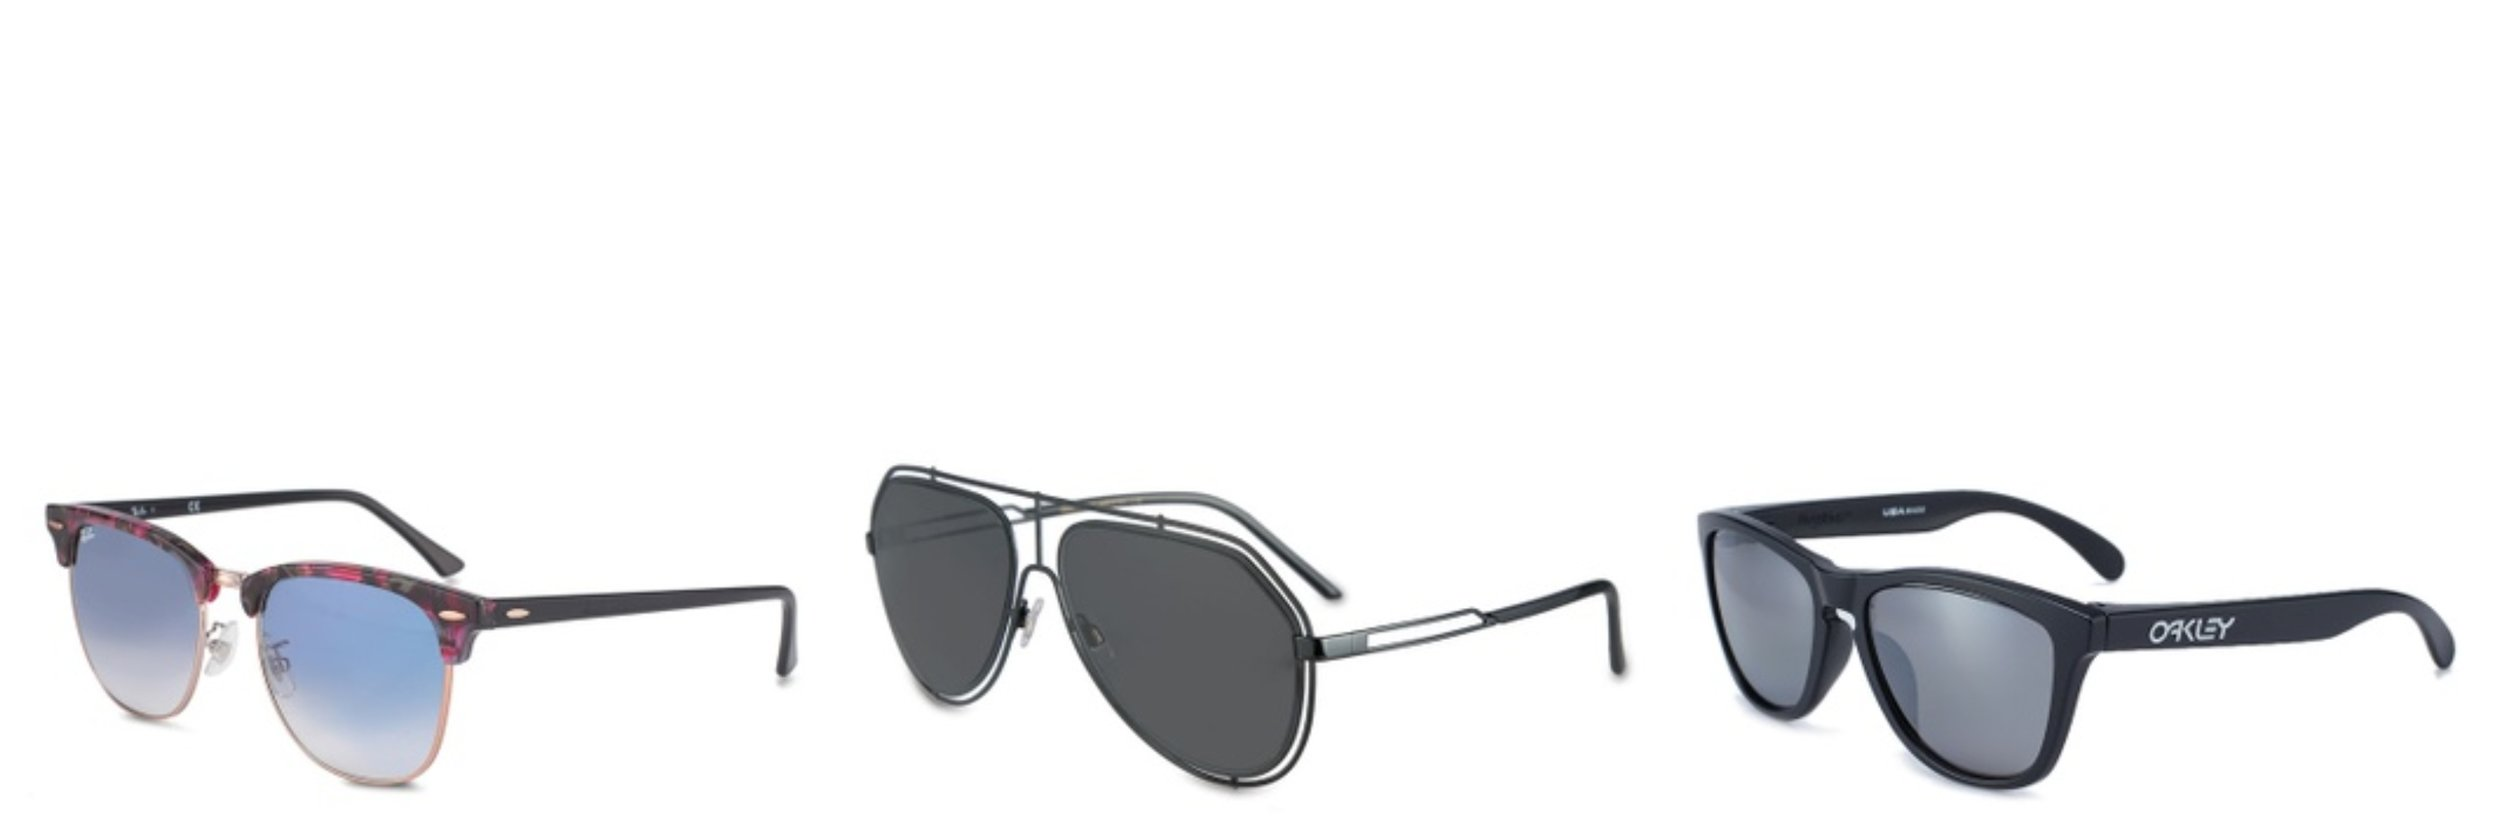 Ray-Ban Icons RB3016F Sunglasses; Oakley Performance Lifestyle OO9245 Sunglasses; Dolce & Gabbana Dolce & Gabbana DG2176 Sunglasses